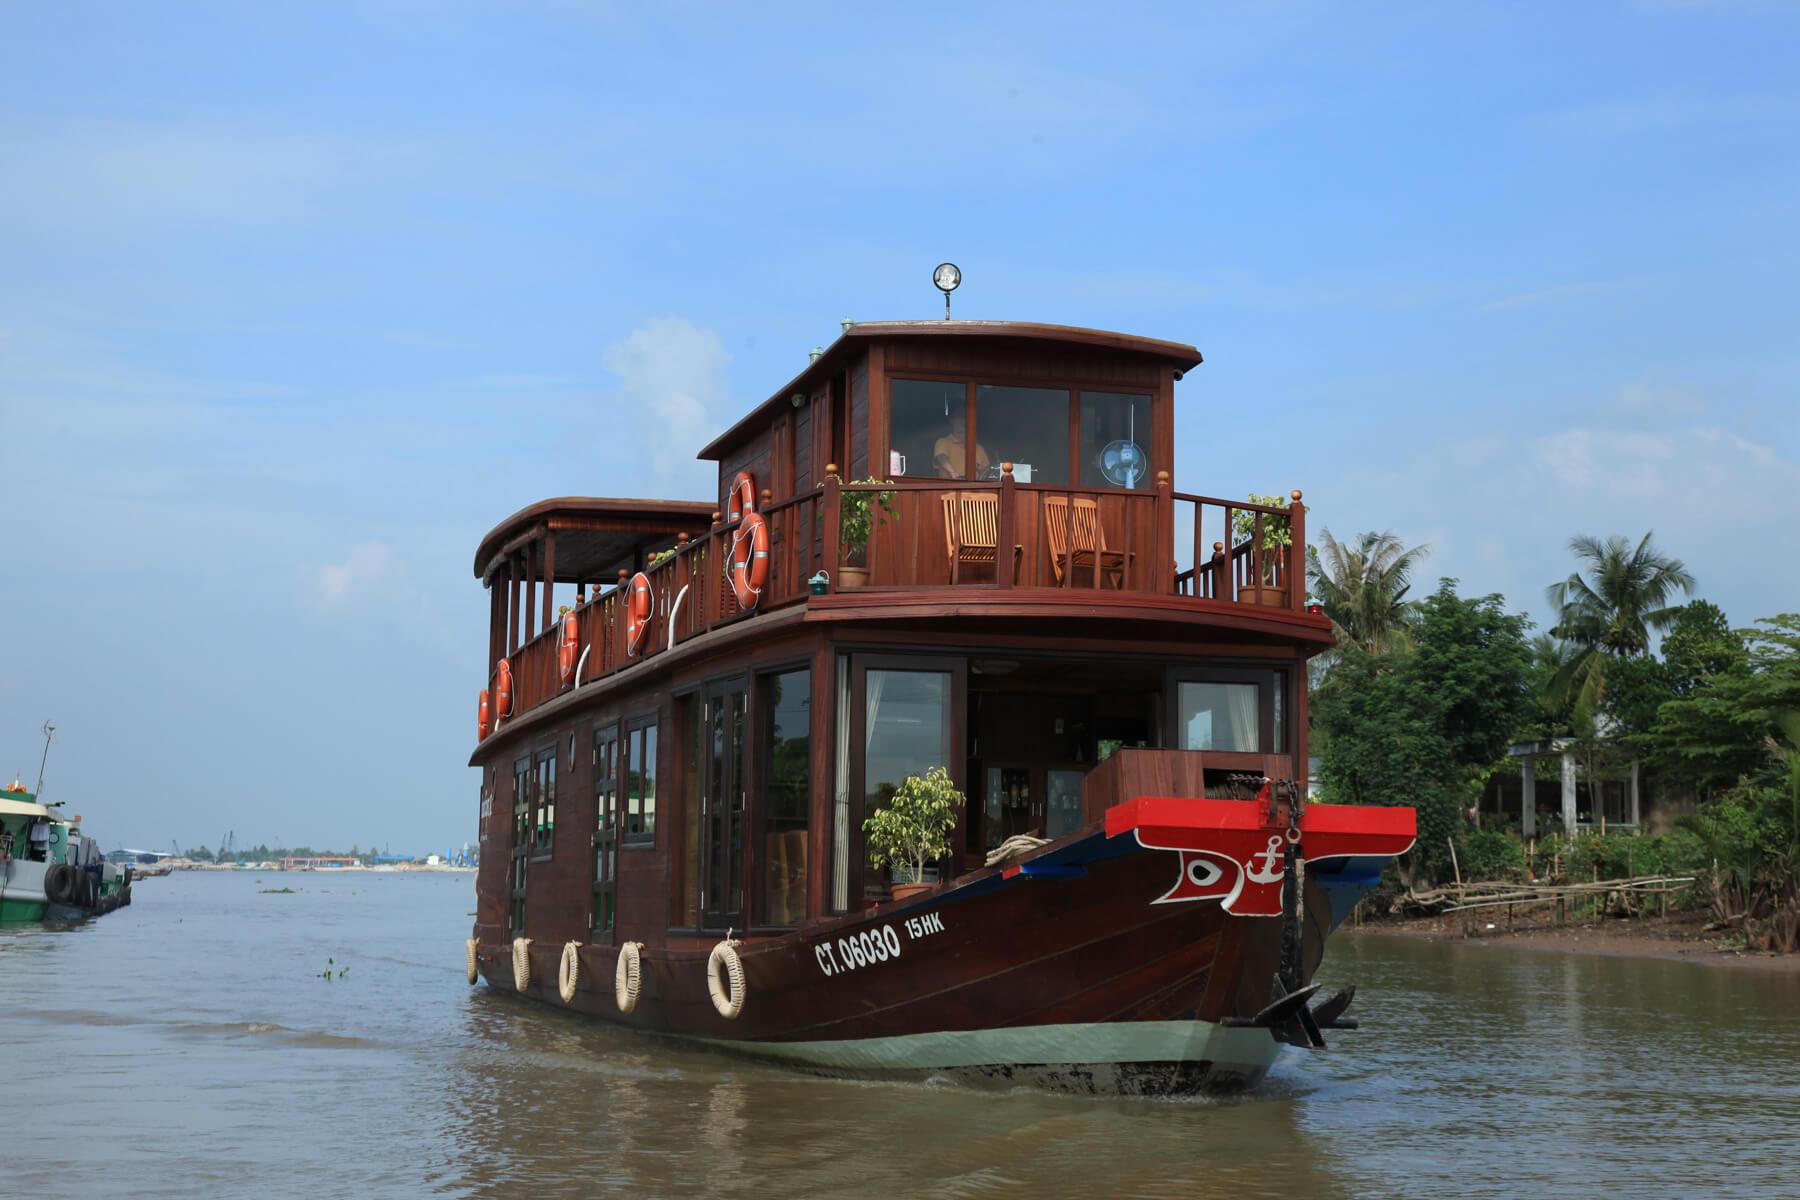 Mekong Delta Tour: Flusskreuzfahrt von Vietnam nach Kambodscha